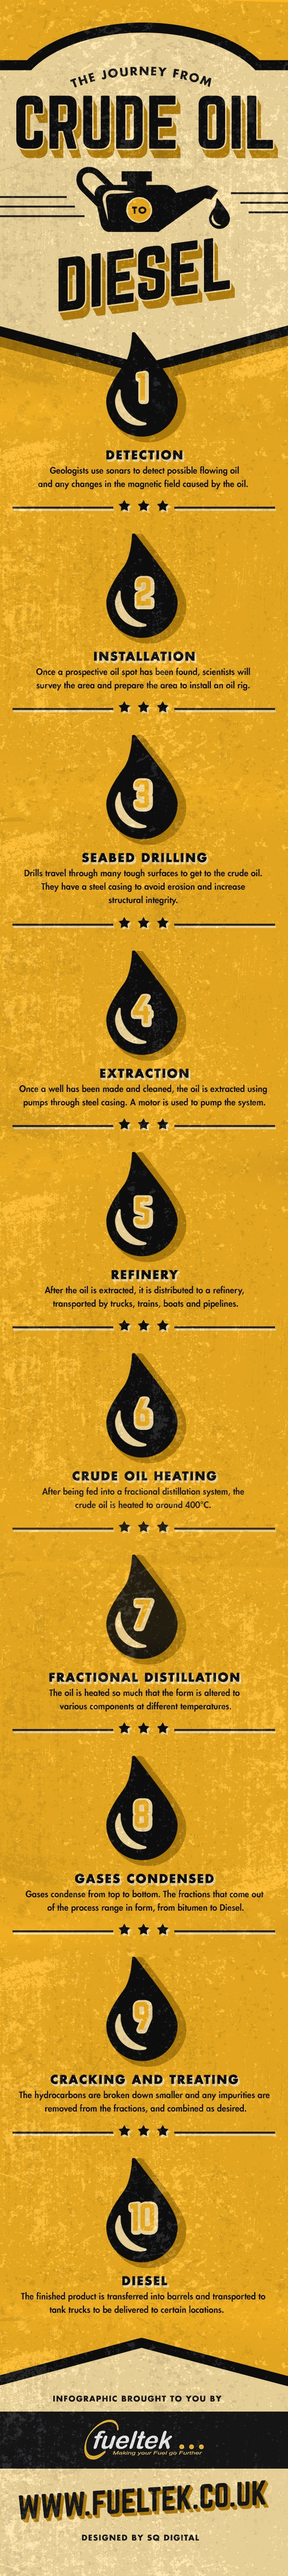 fueltek-infographic